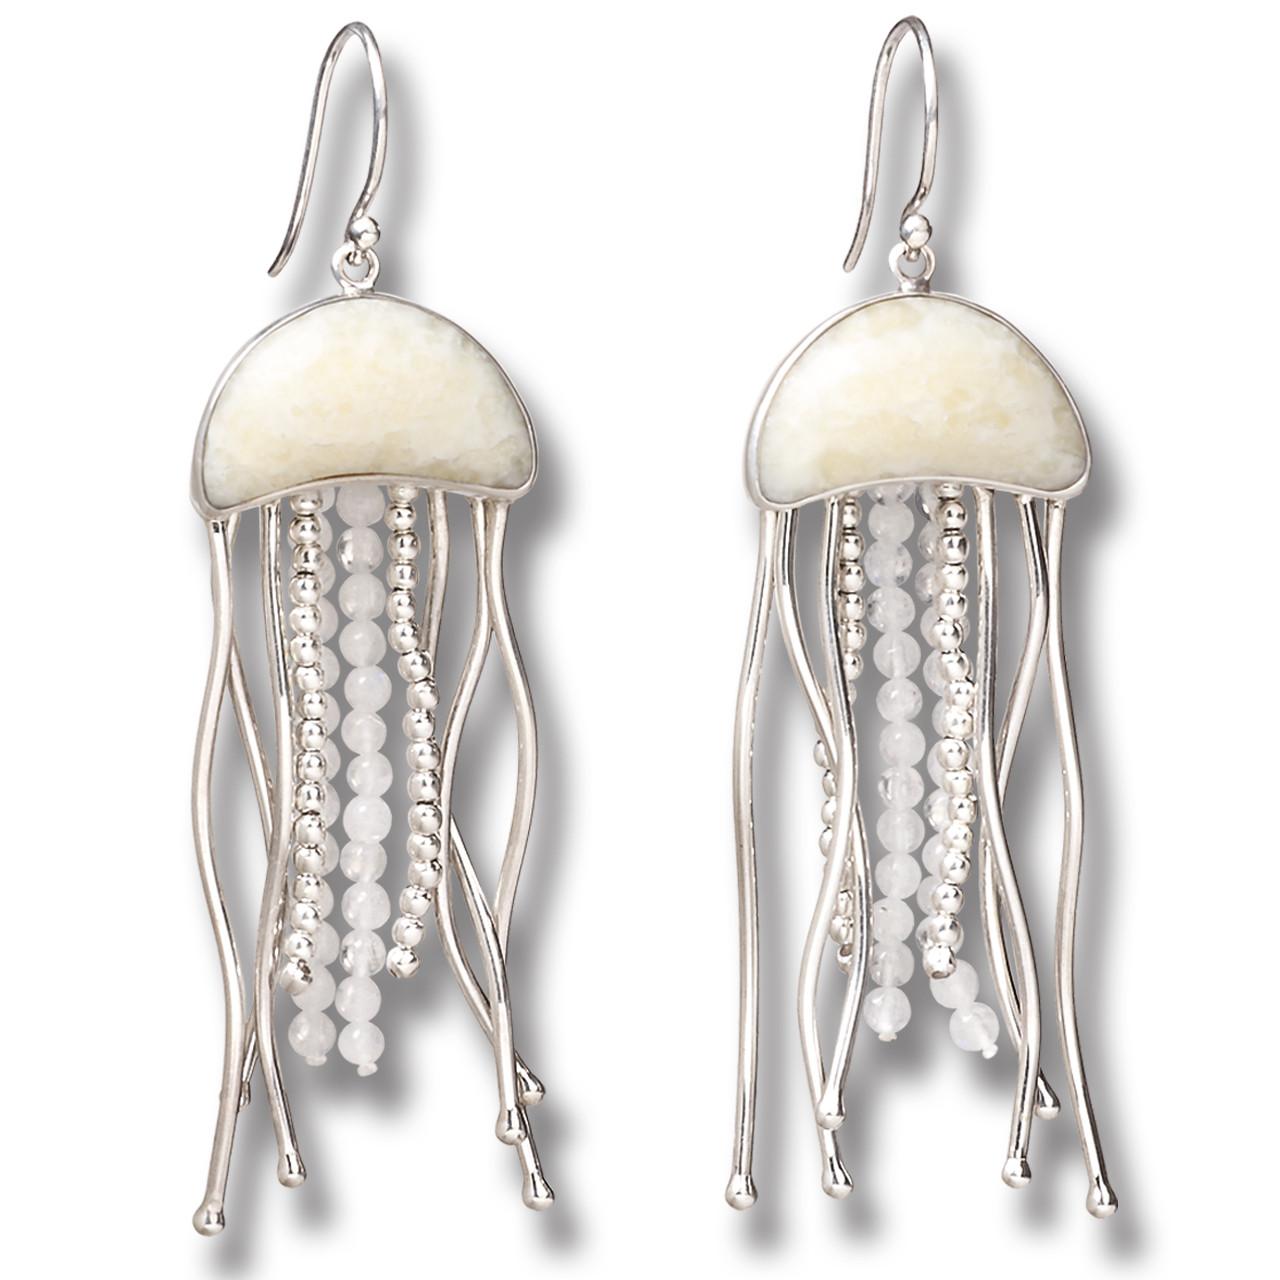 8ab568543 Fossilized Walrus Ivory Jelly Fish Earrings, Rainbow Moonstone Handmade  Silver - Jelly Fish